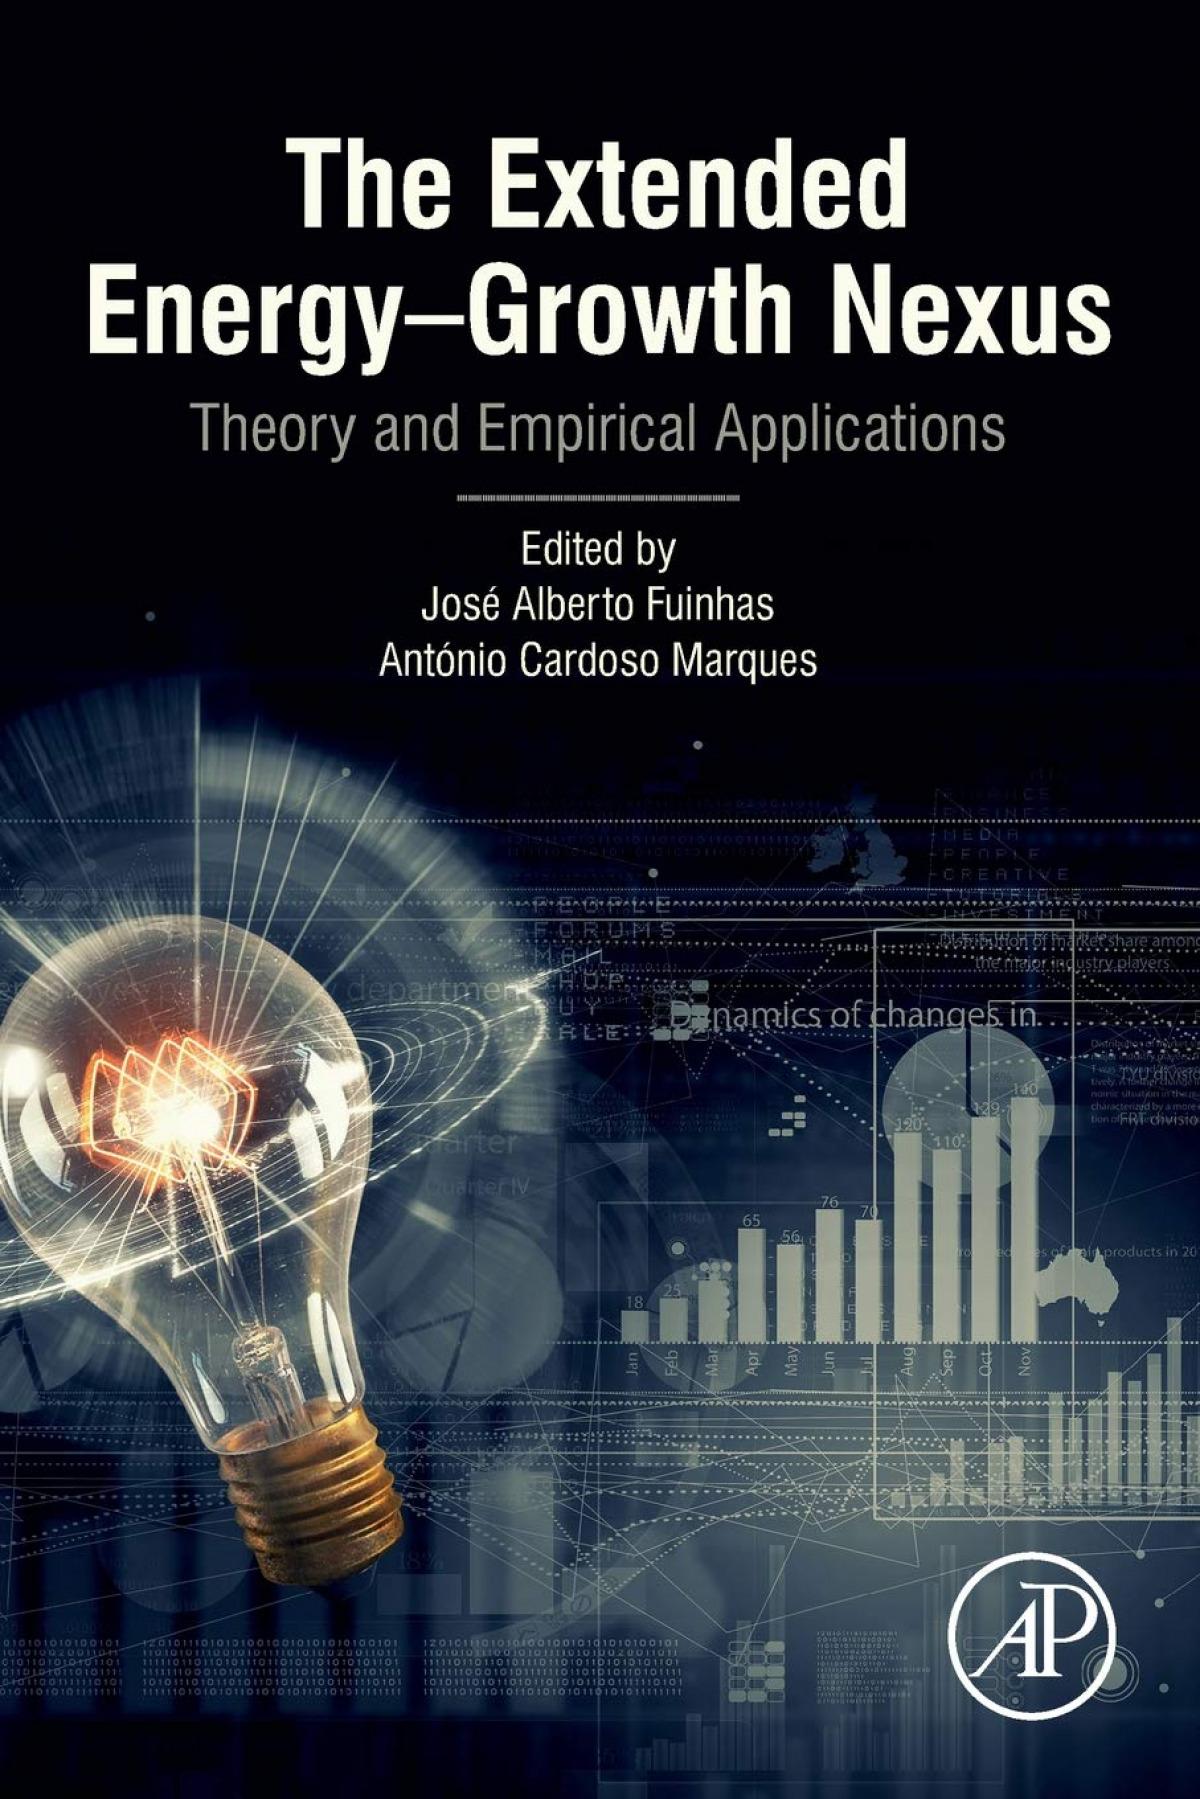 Extended energy-growth nexus